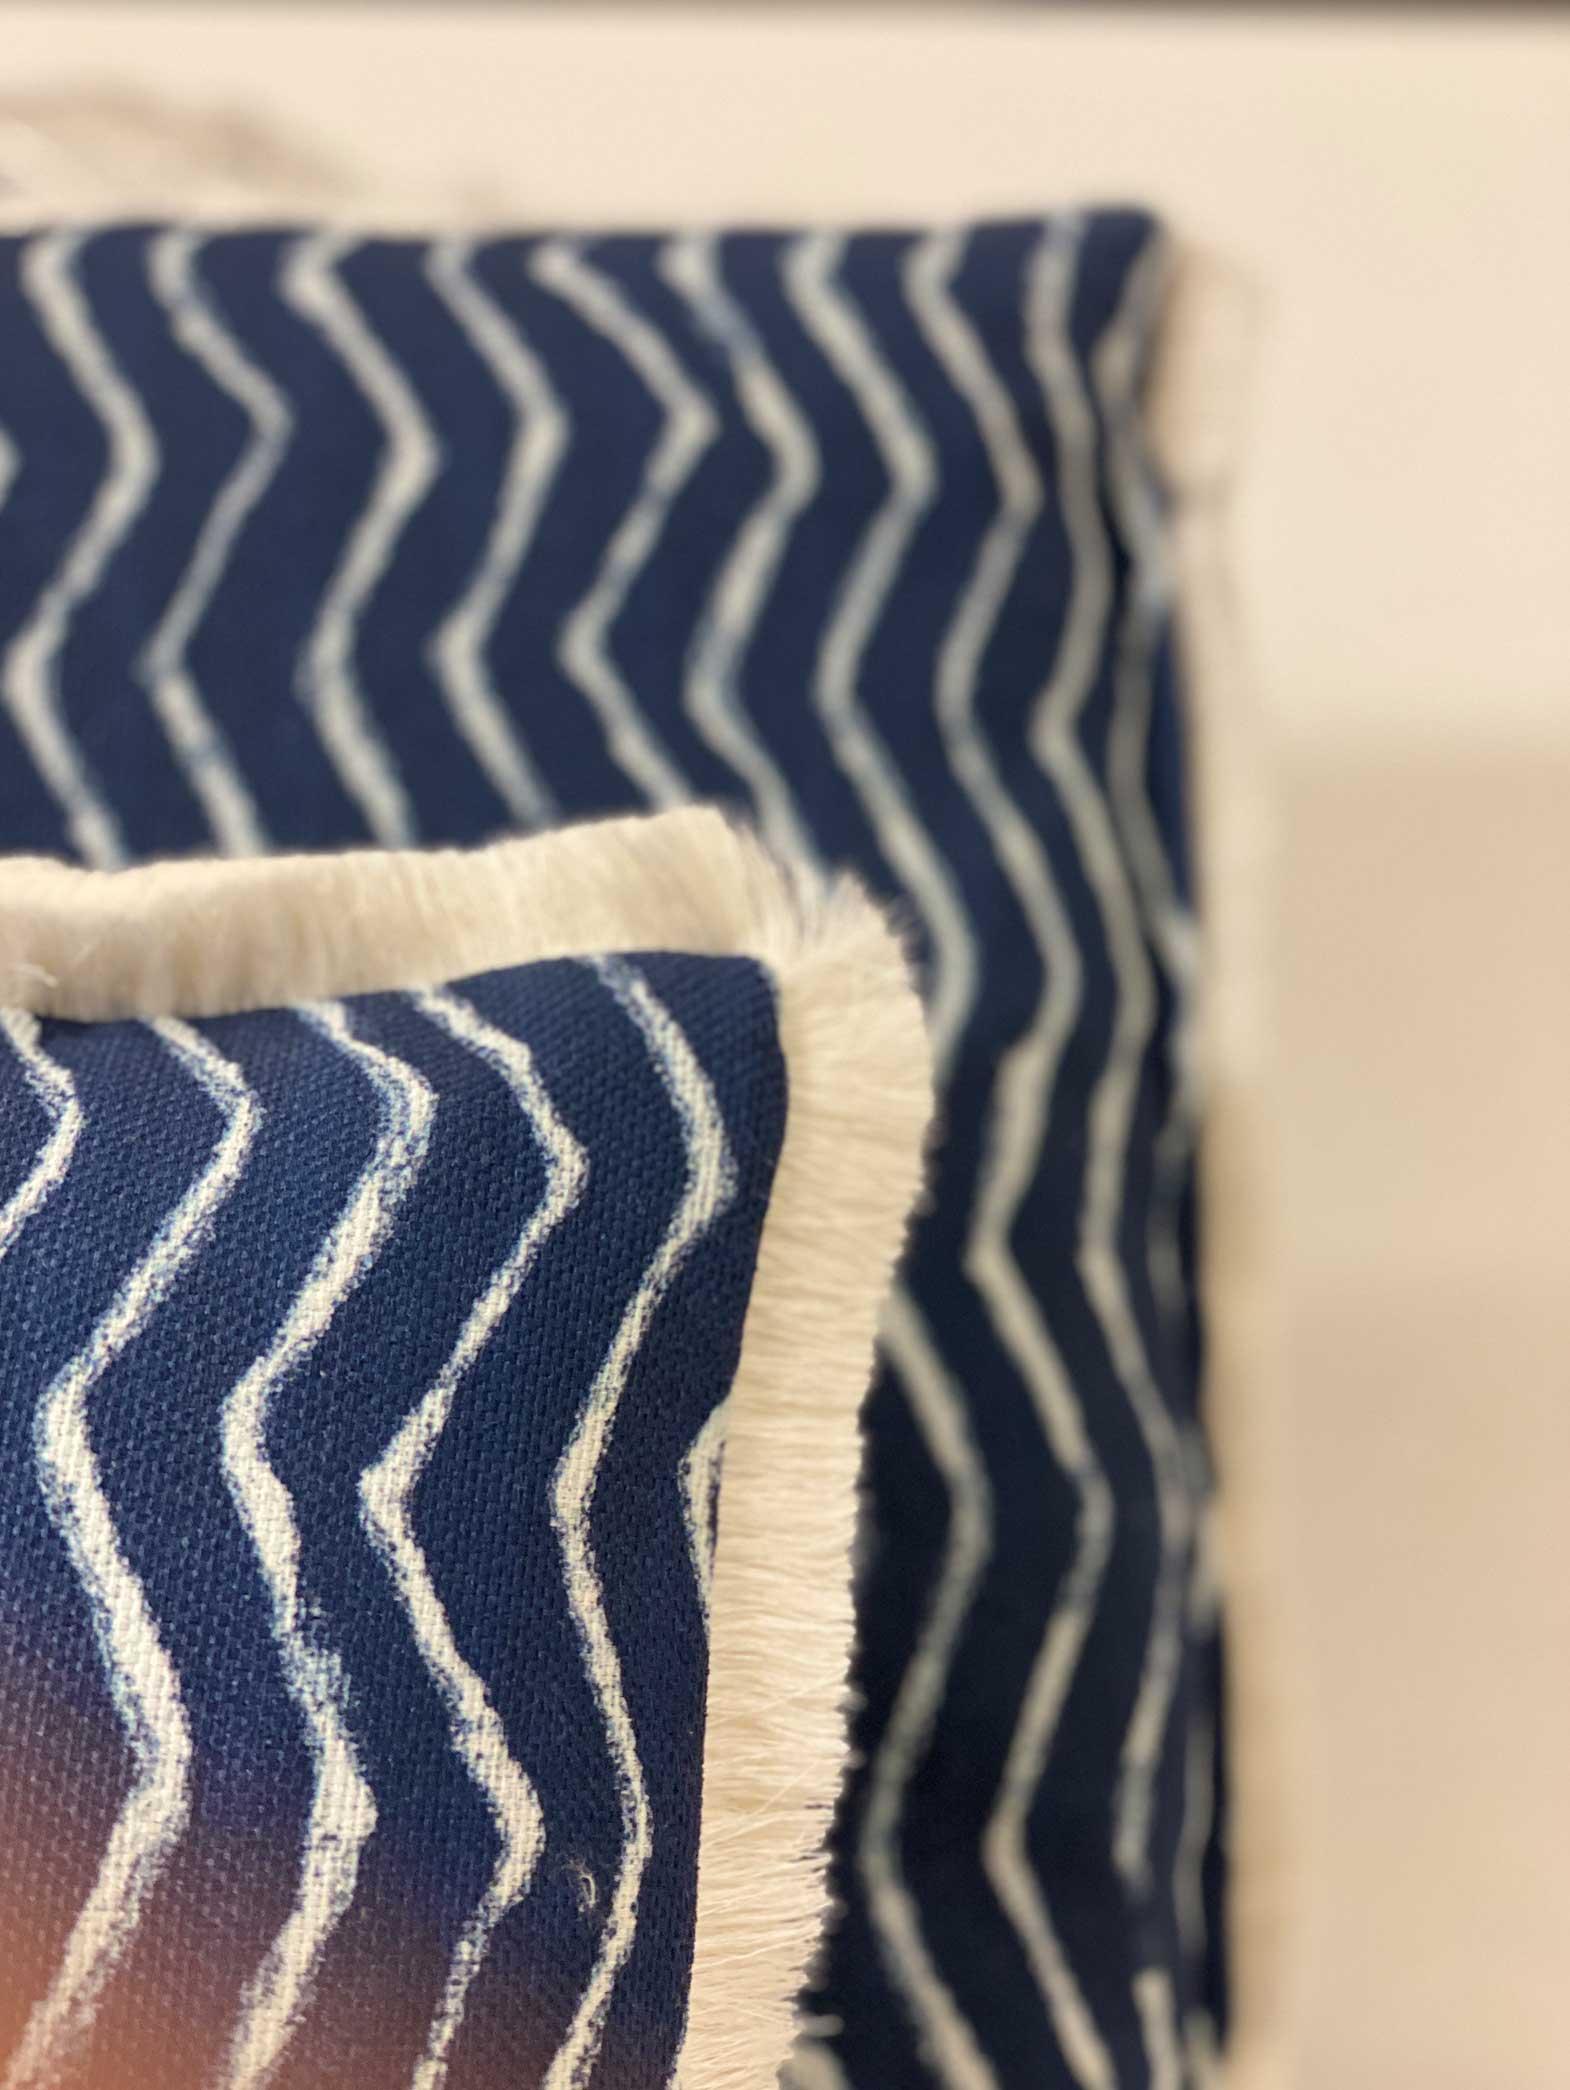 19-square-pillows-brush-fringe3